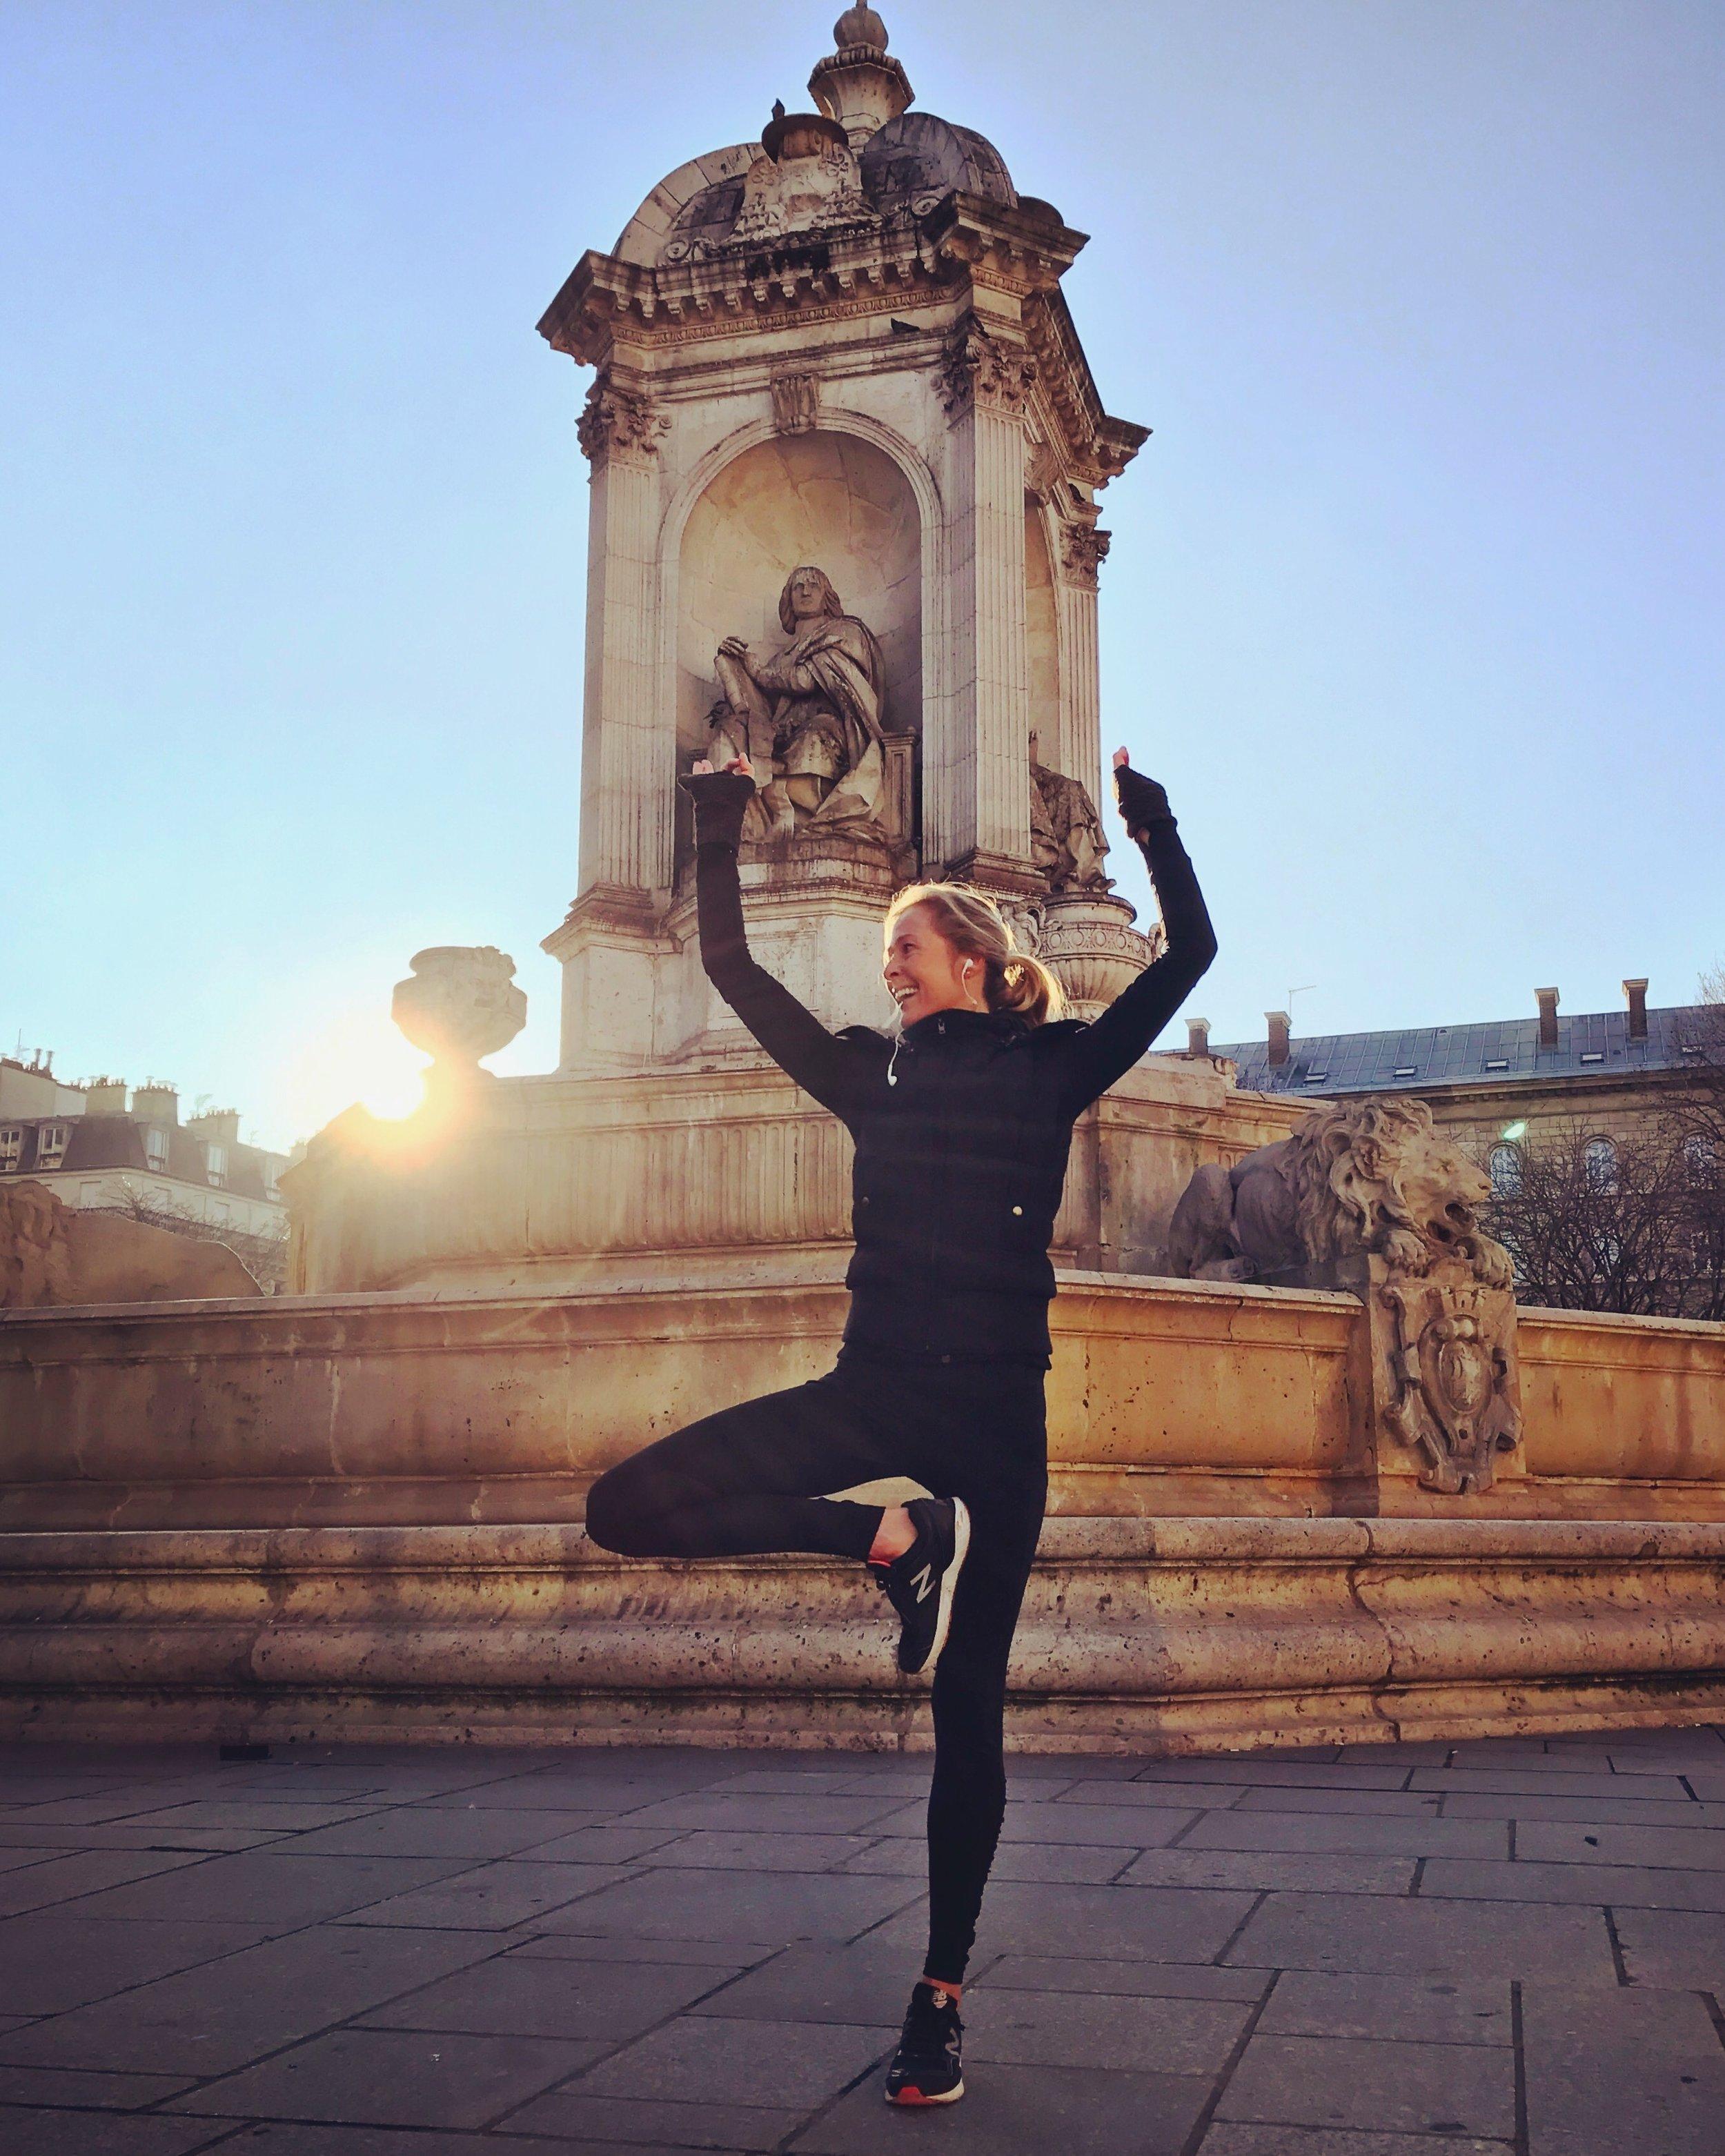 Post-run yoga stretches in minus 2 degree Celsius conditions, St Sulpice, Paris